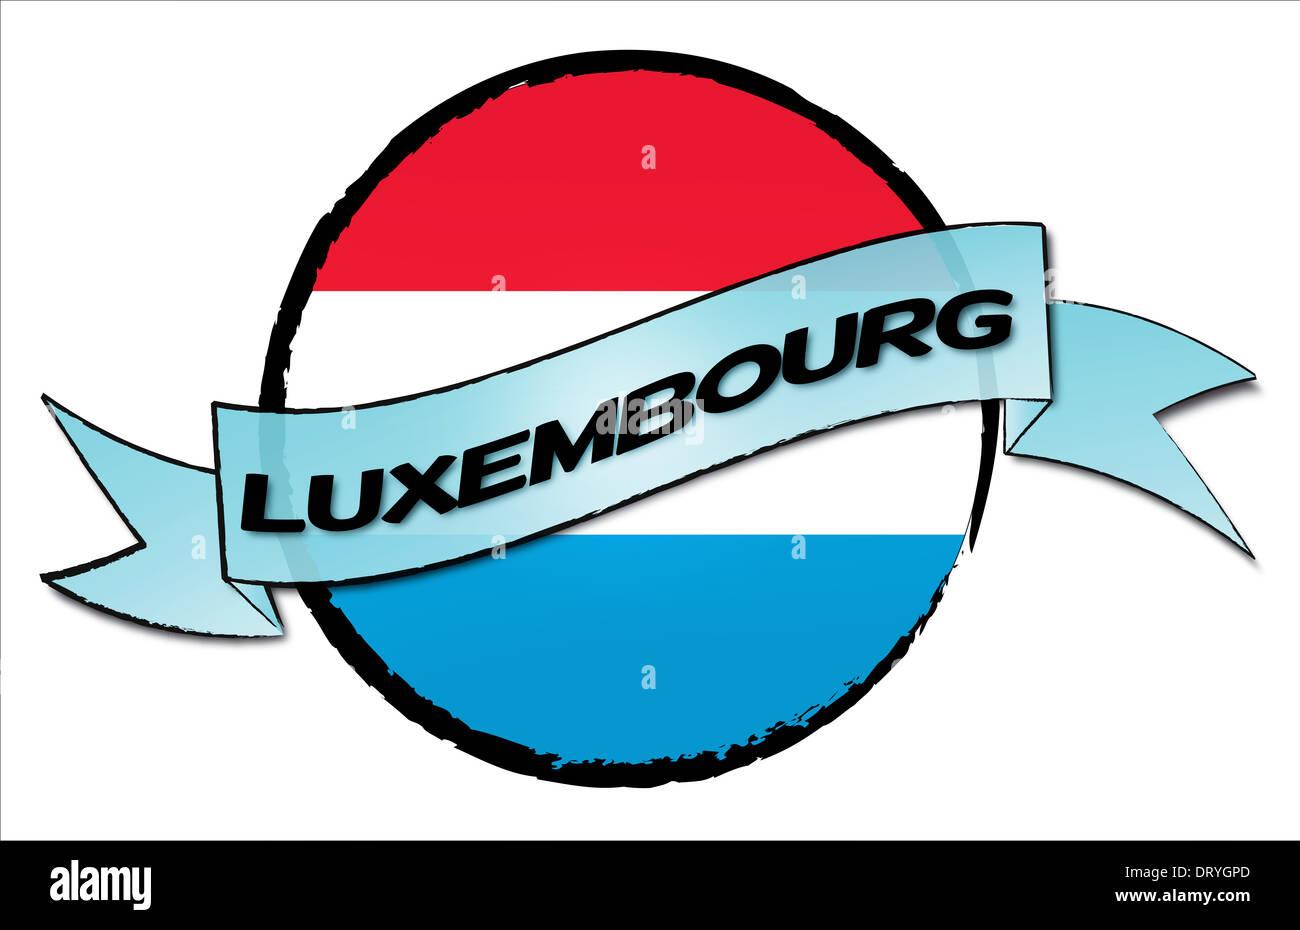 Circle Land LUXEMBOURG - Stock Image